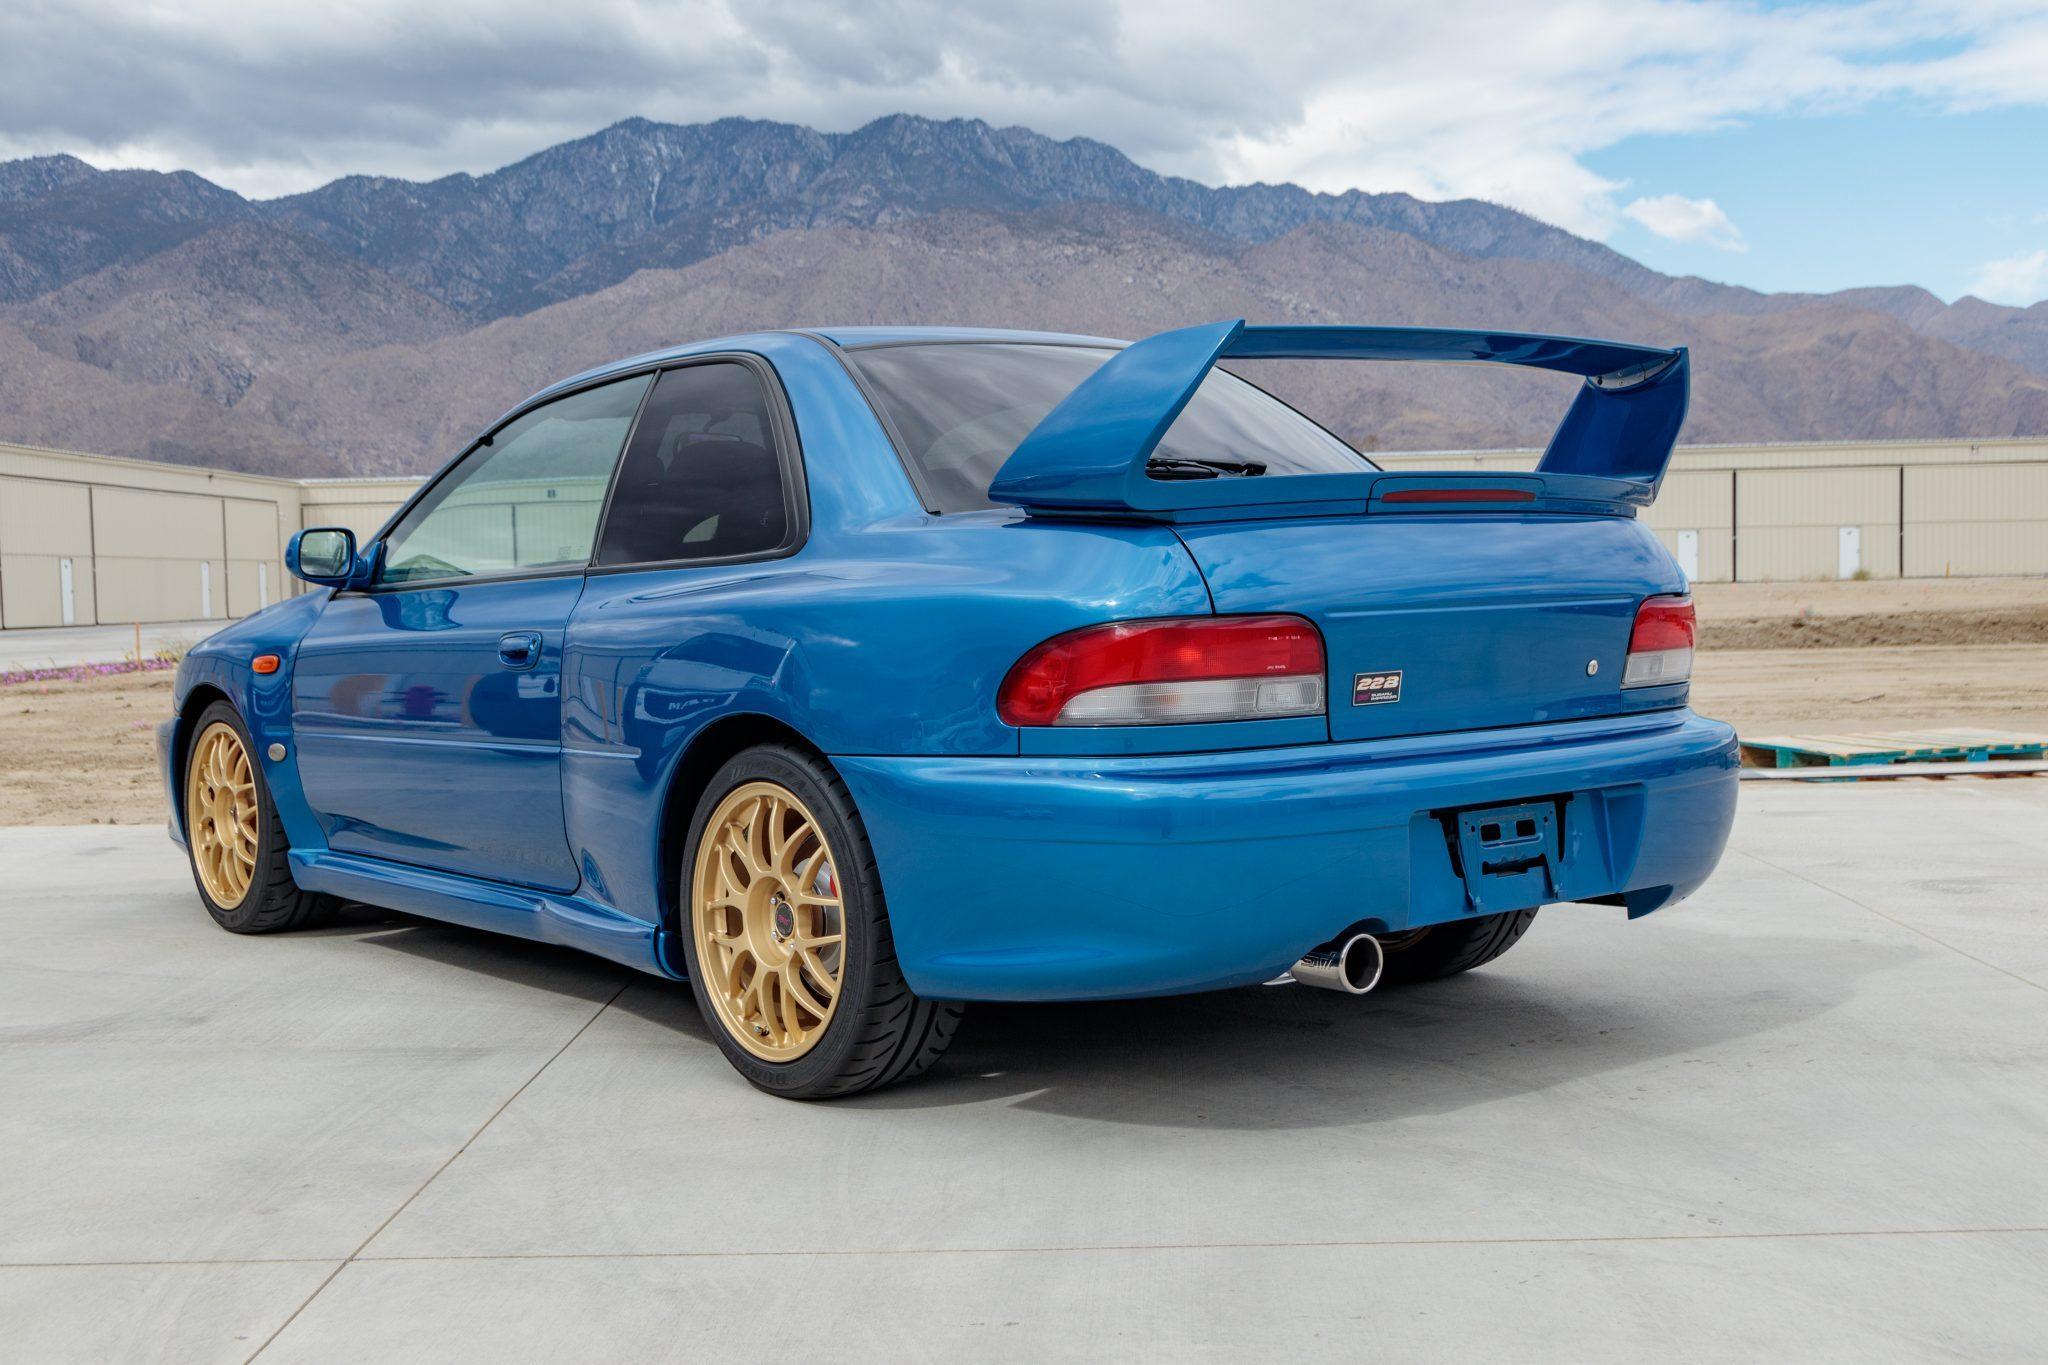 Cette rare Subaru Impreza 22B vendue à prix d'or (+ images) !